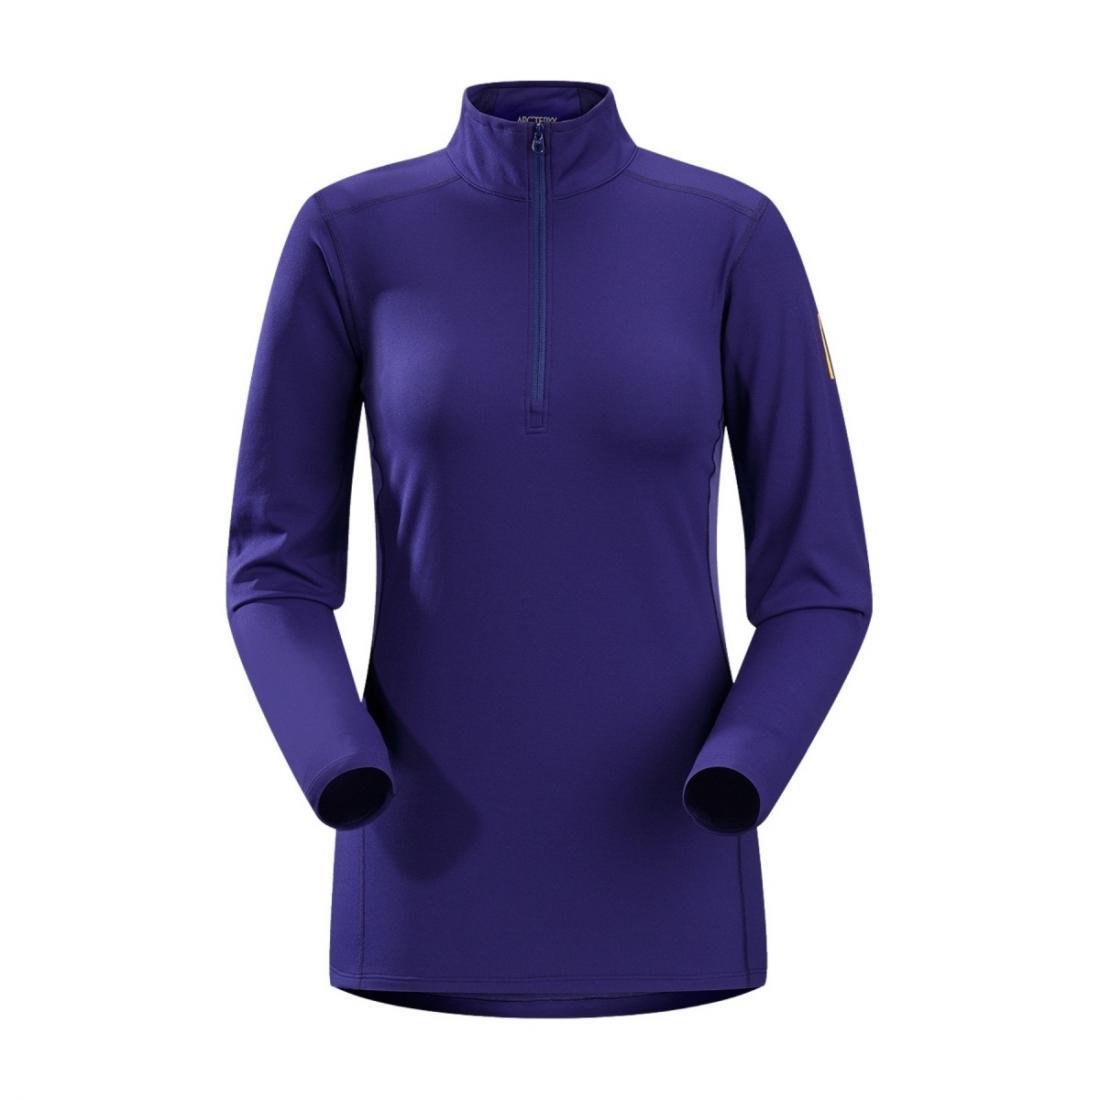 Термобелье футболка Phase AR Zip Neck жен. длин.рукавФутболки<br><br><br>Цвет: Синий<br>Размер: L